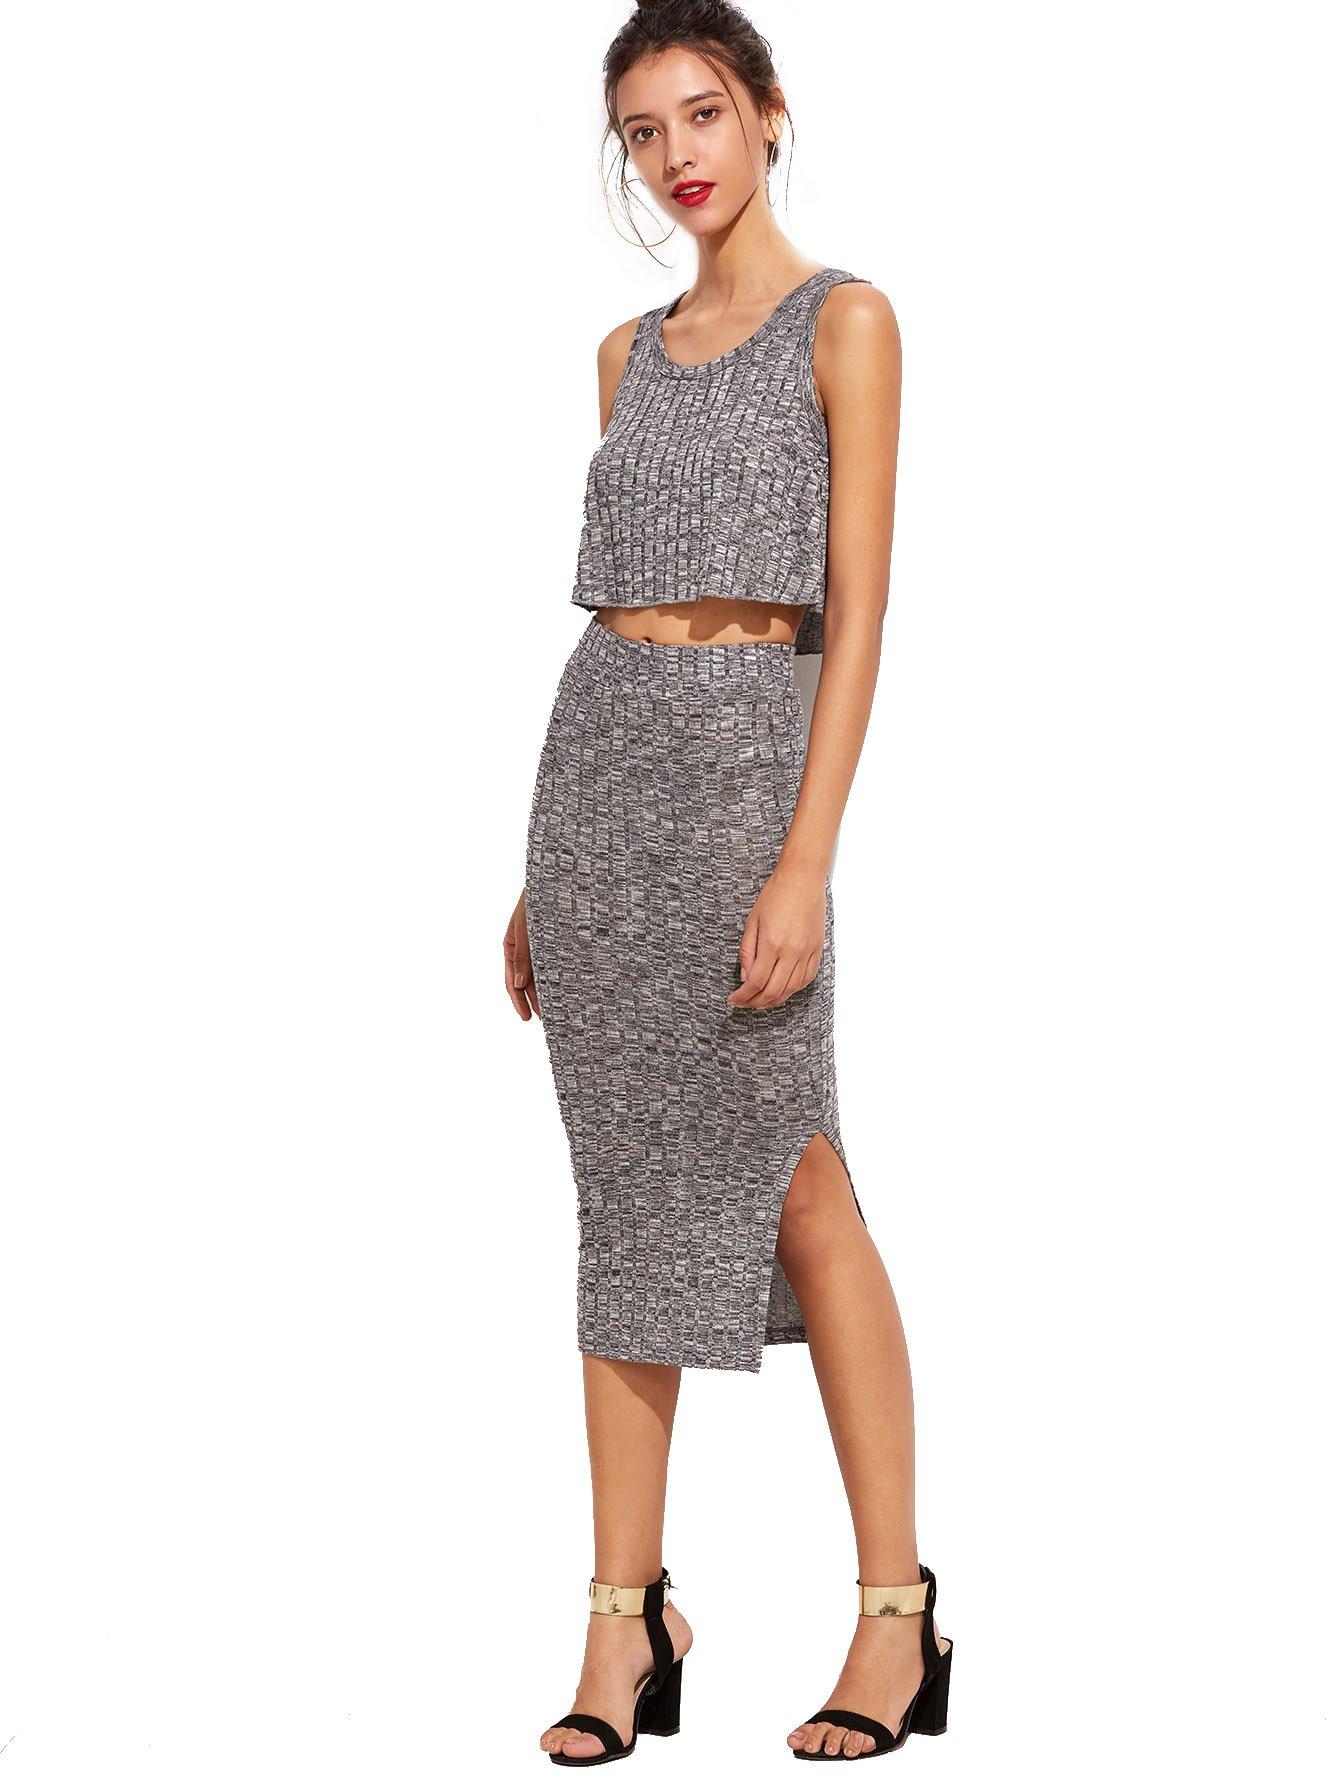 Romwe Women's 2 Piece Crop Tank Top with Skirt Set Sleeveless Bodycon Mini Dress 1-Gray Medium by Romwe (Image #1)